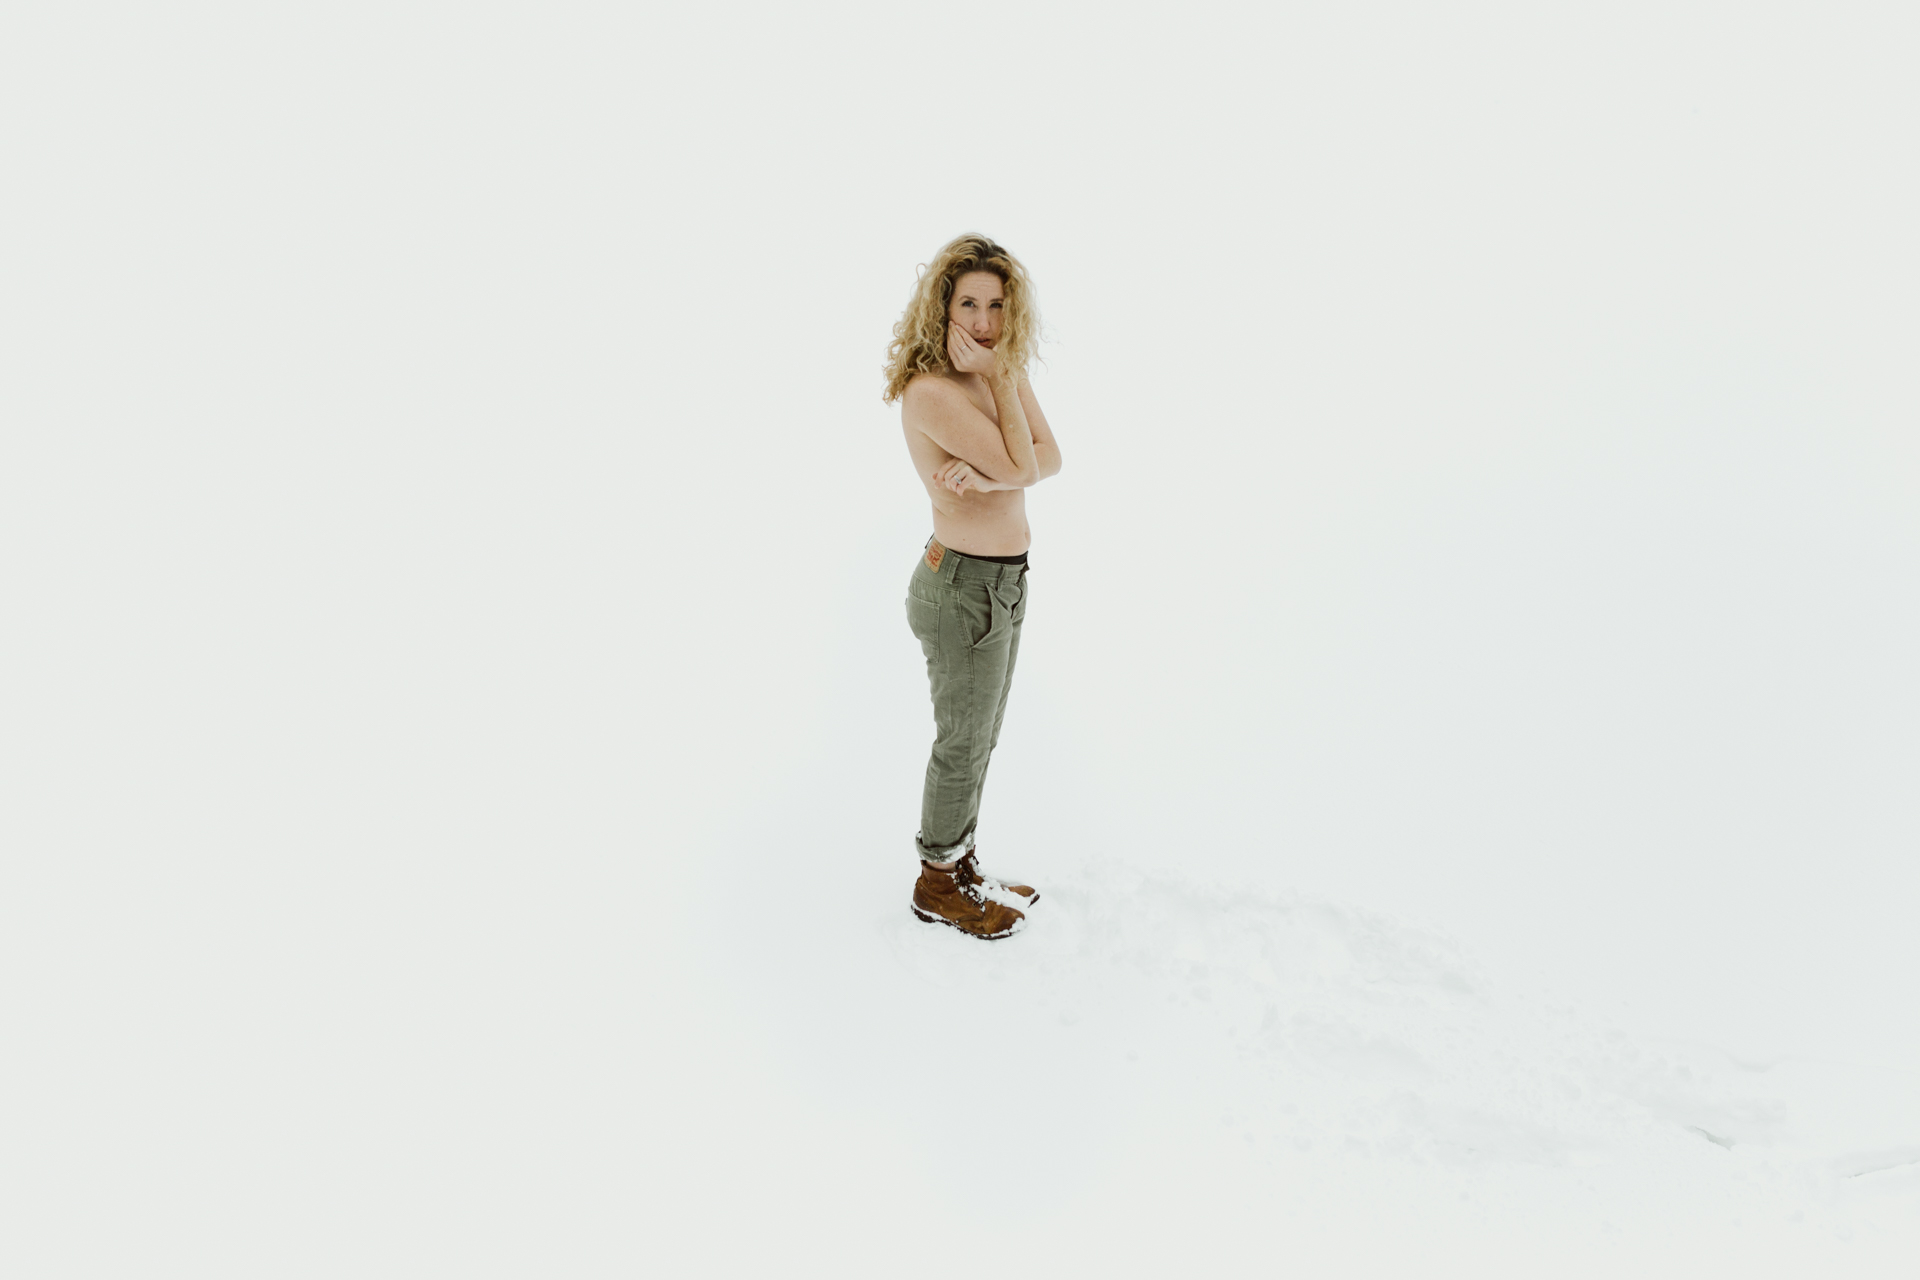 rachel_snow_storm_model-1000-2.jpg